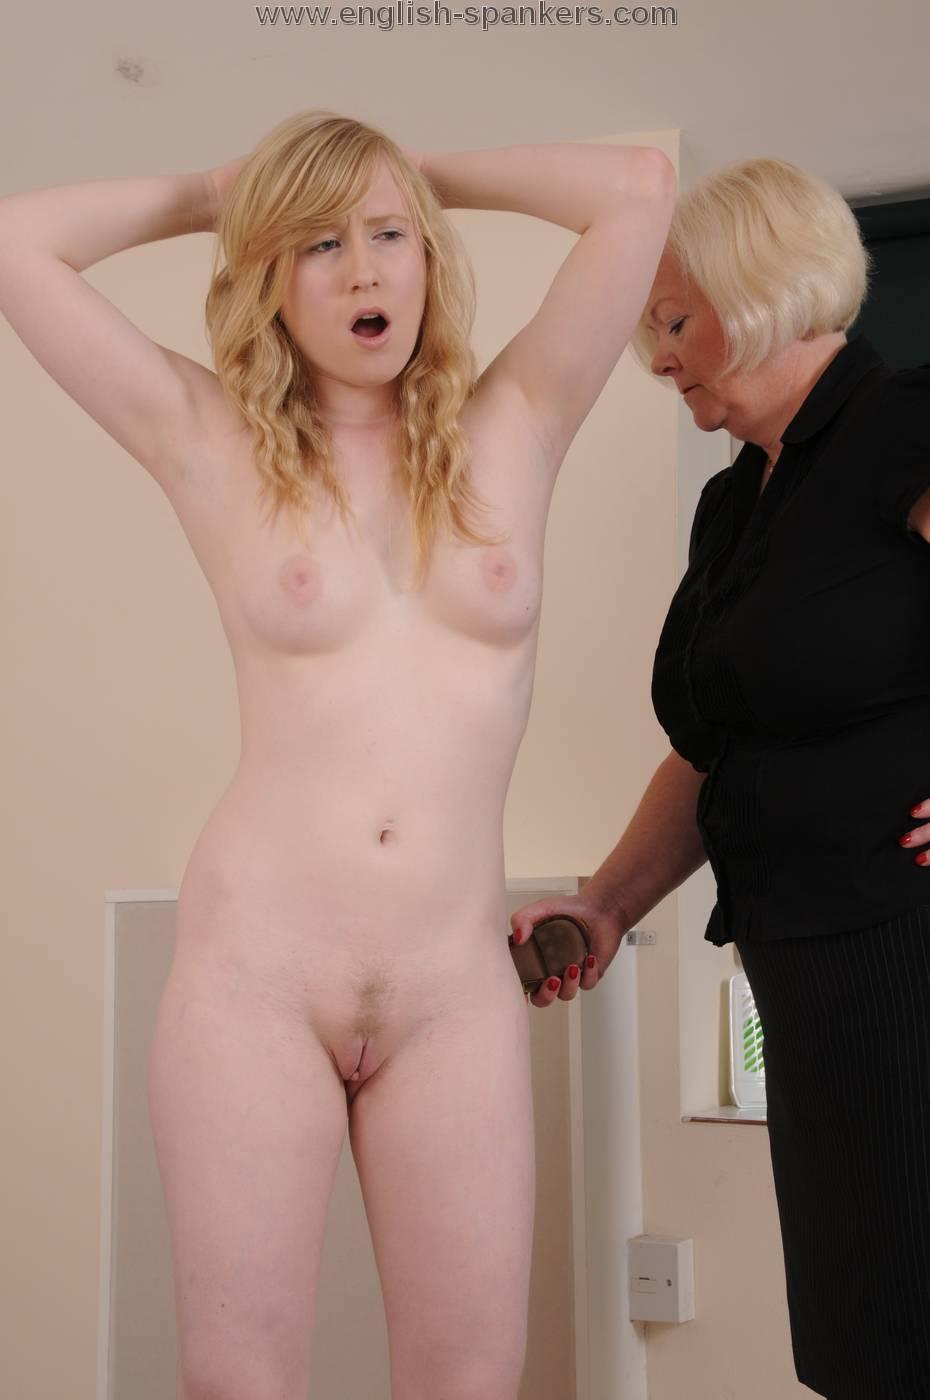 spanking positions tumblr